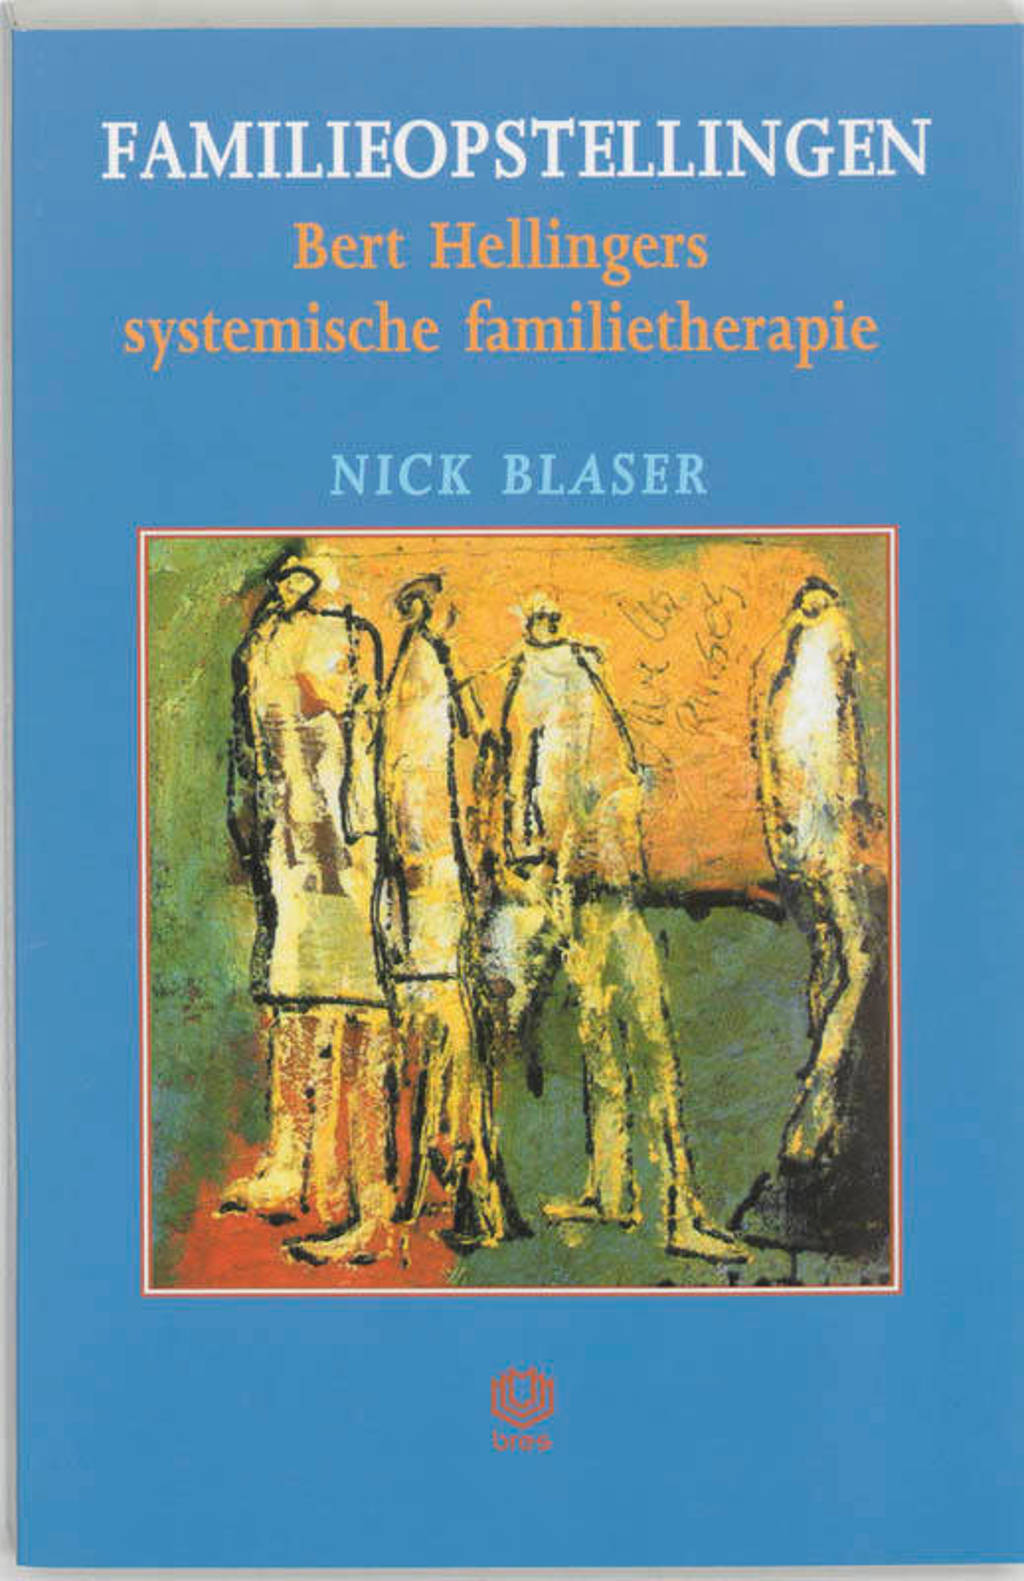 Familieopstellingen - Nick Blaser